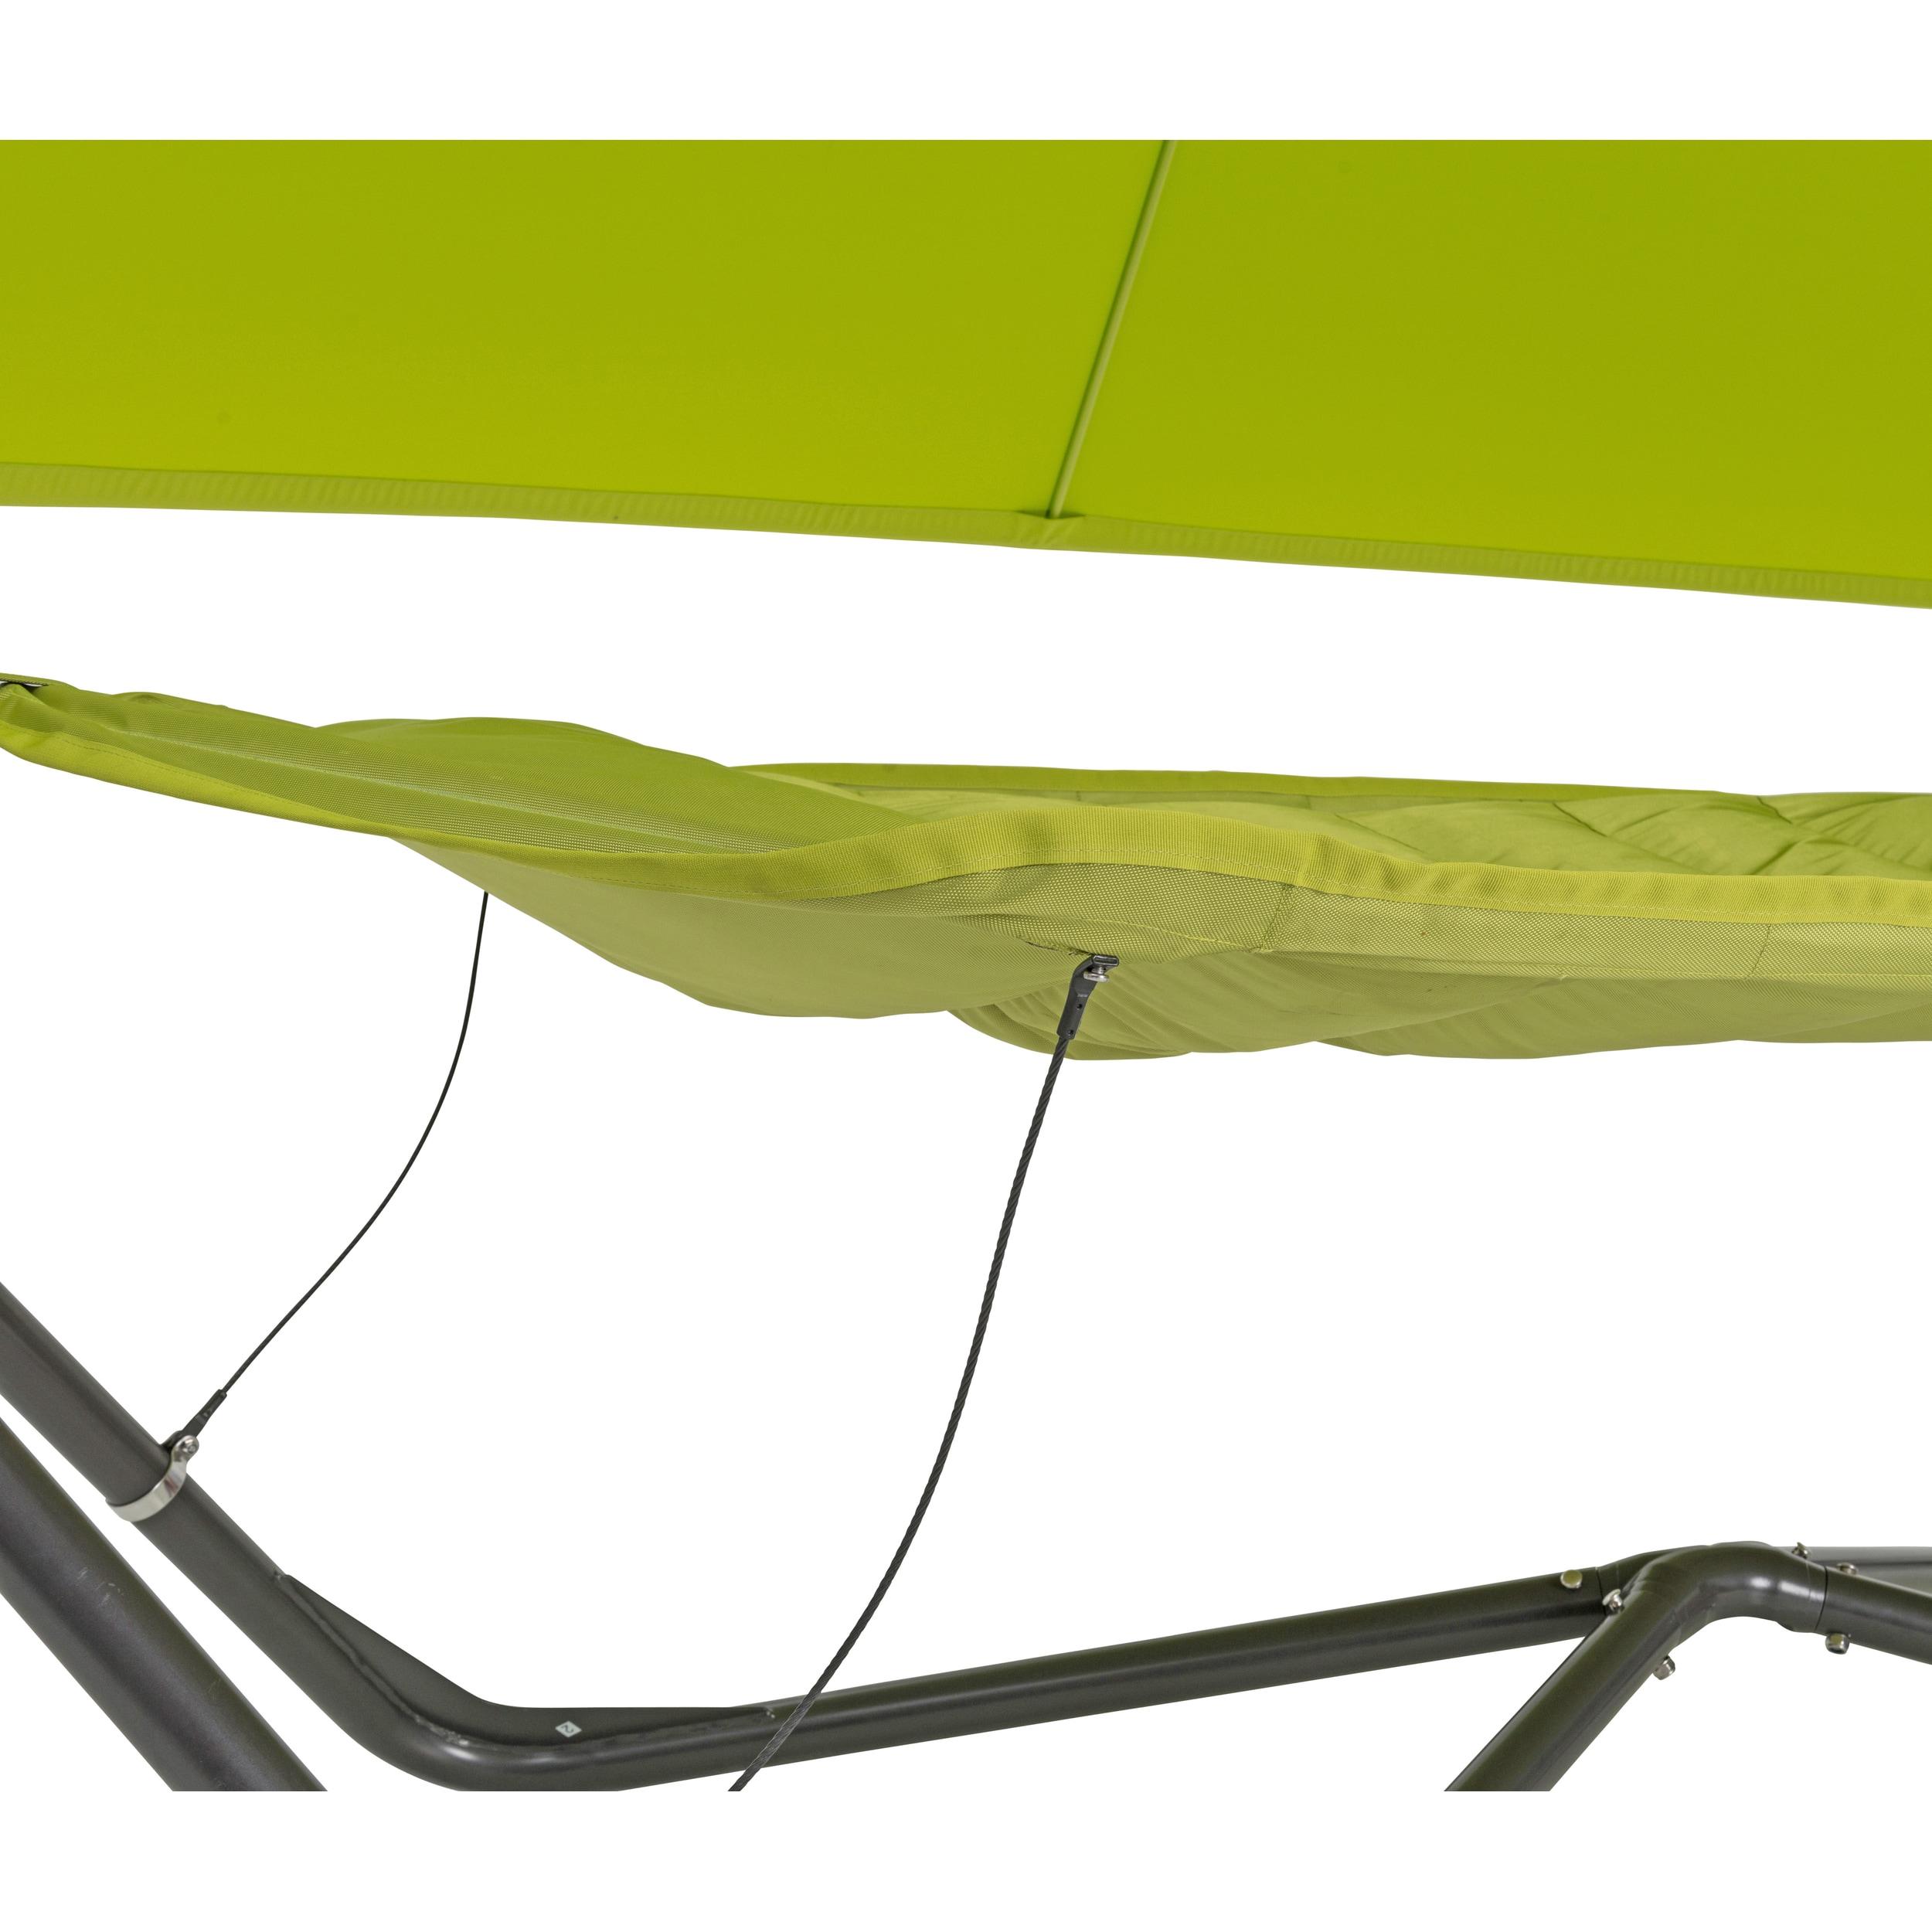 fits single cool pin breeze nylon stand net foot size hammock